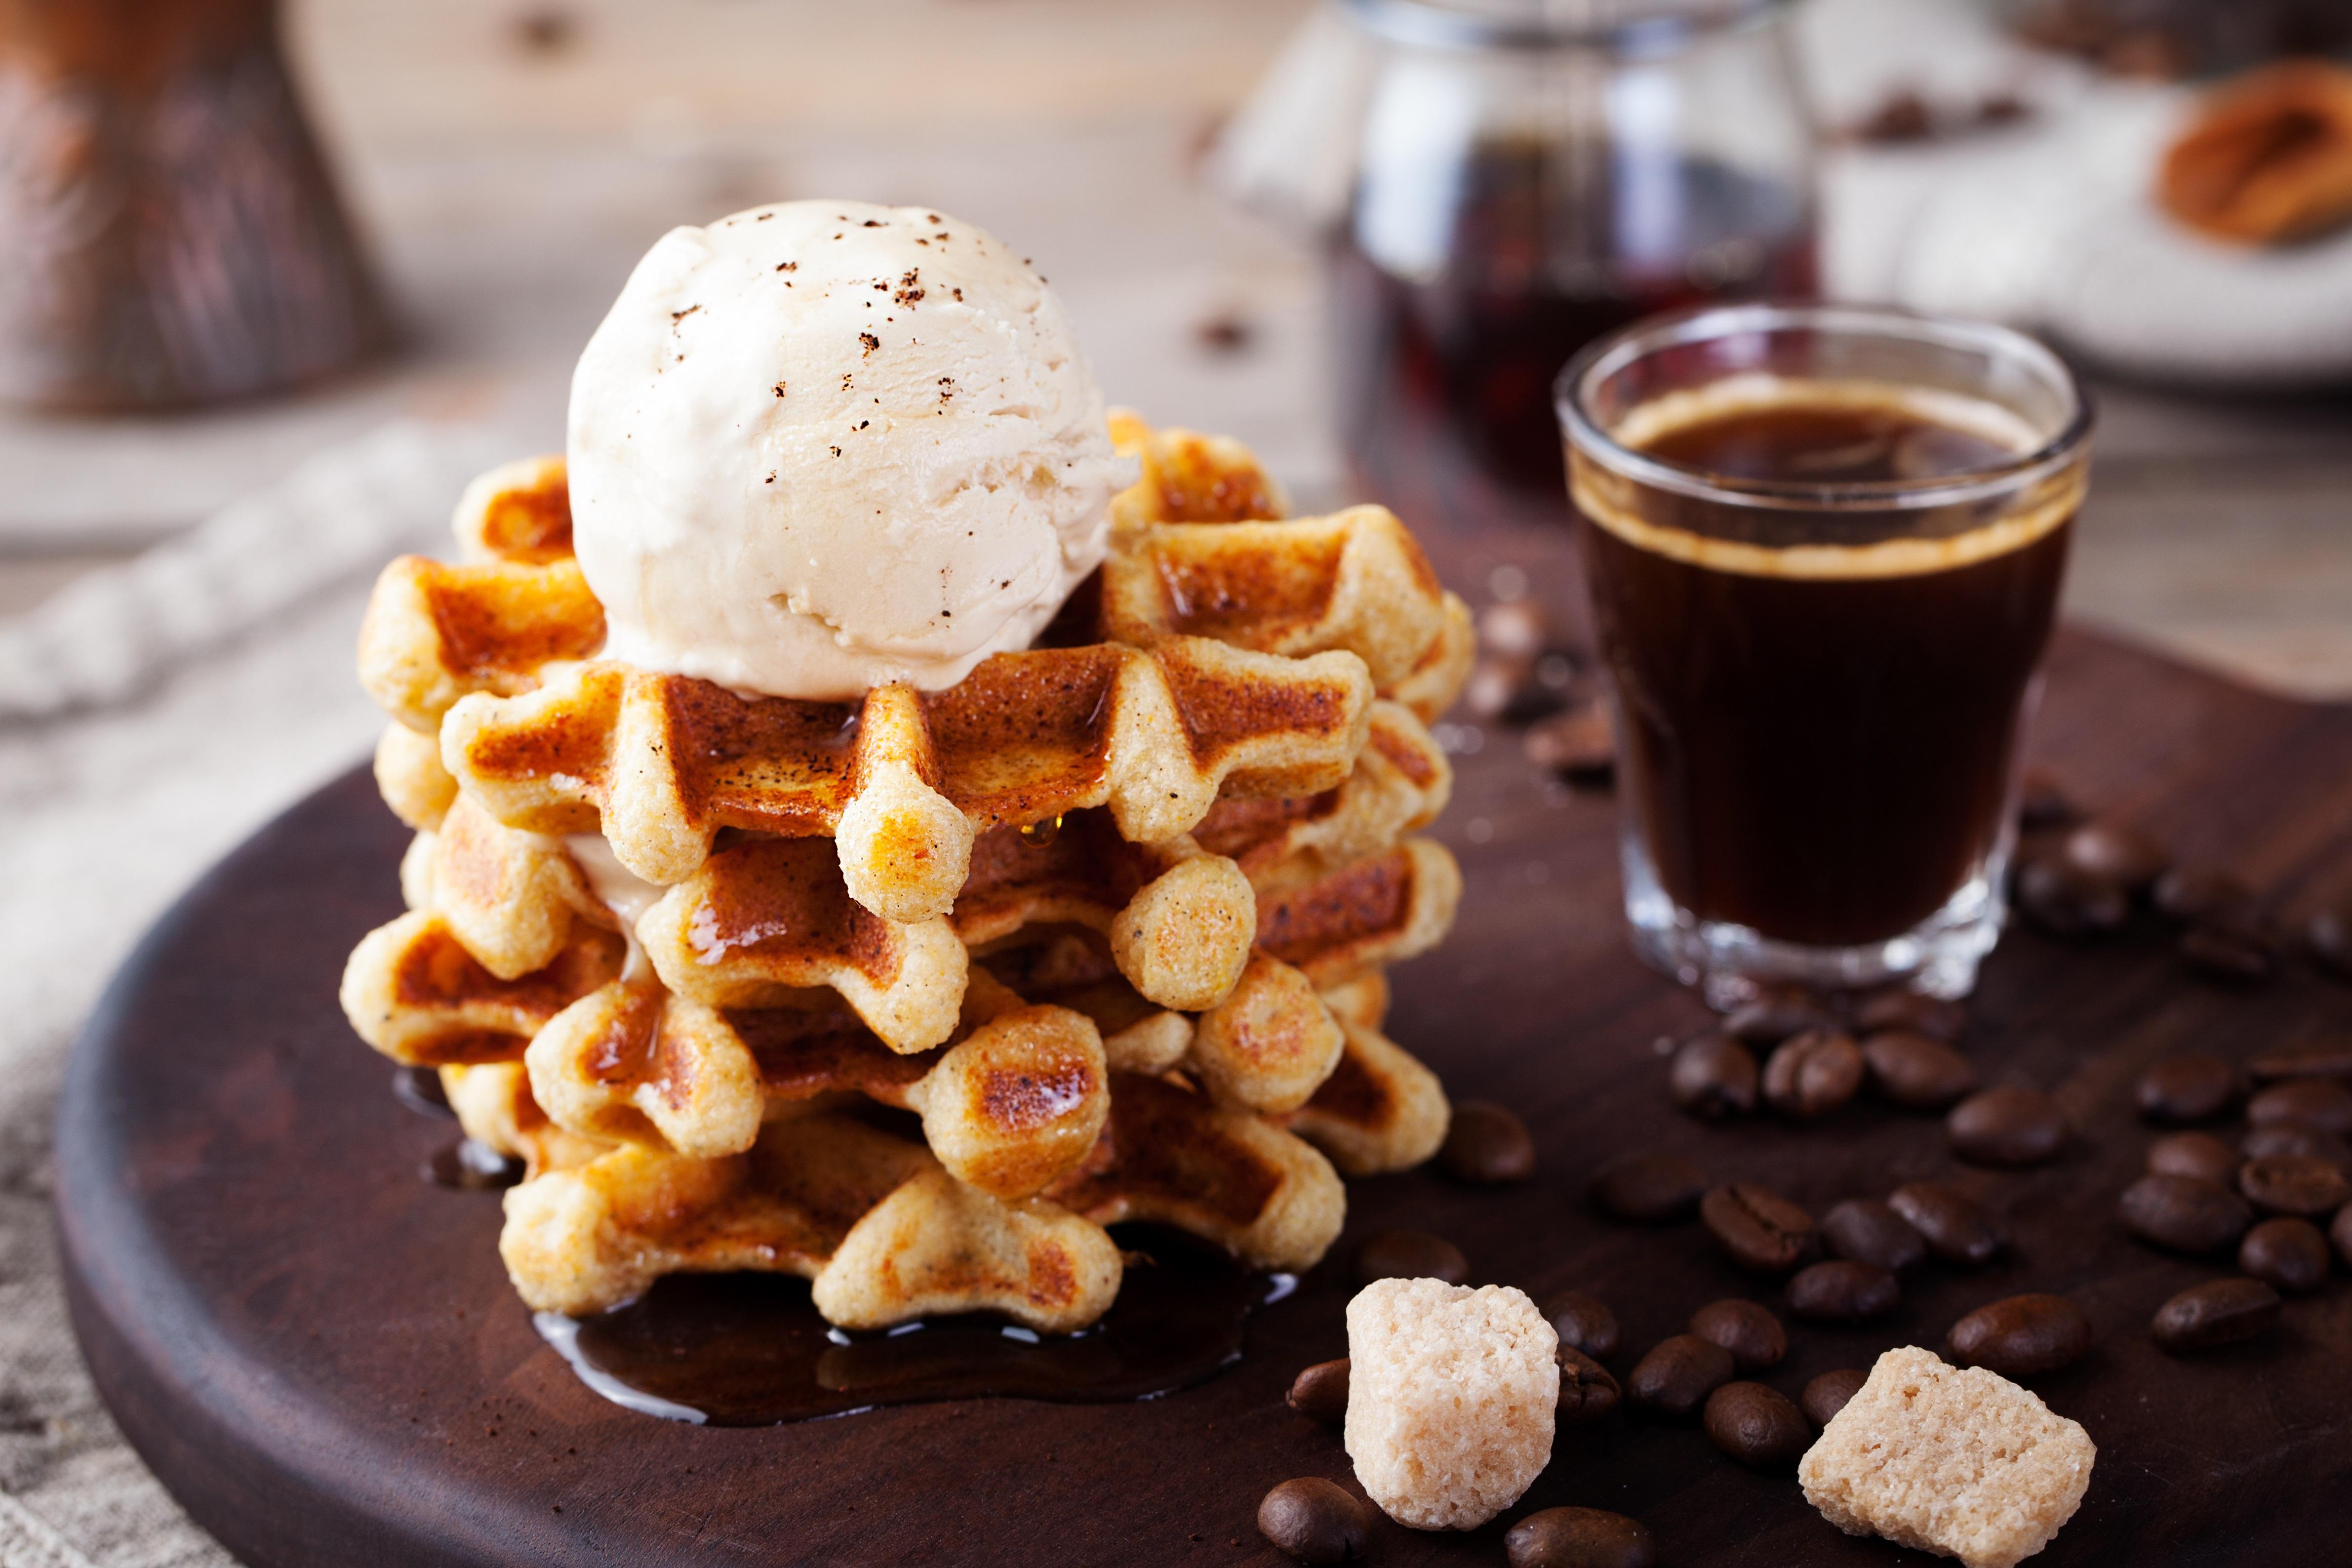 Cafe Dessert Bar